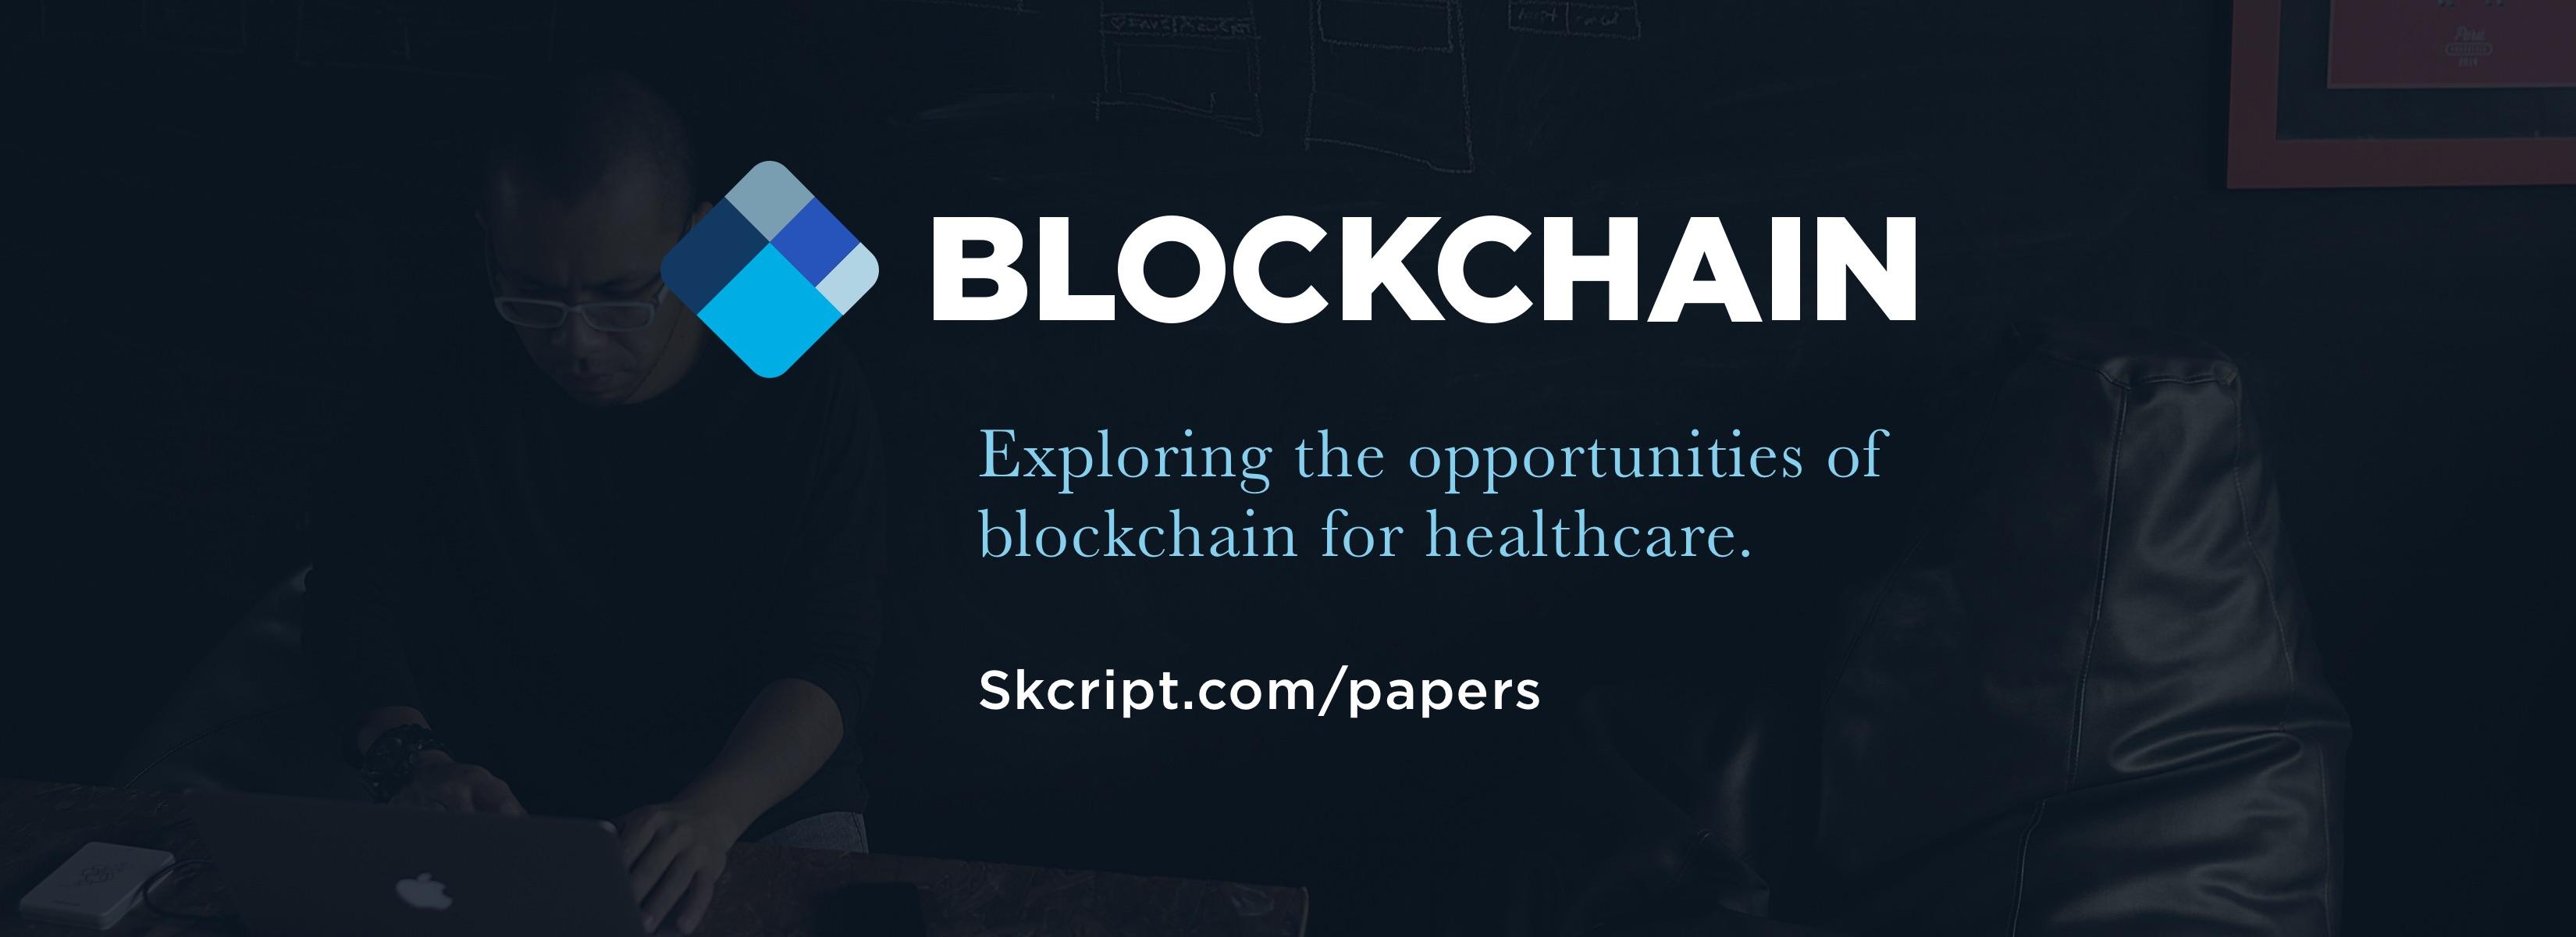 Blockchain for Healthcare White Paper